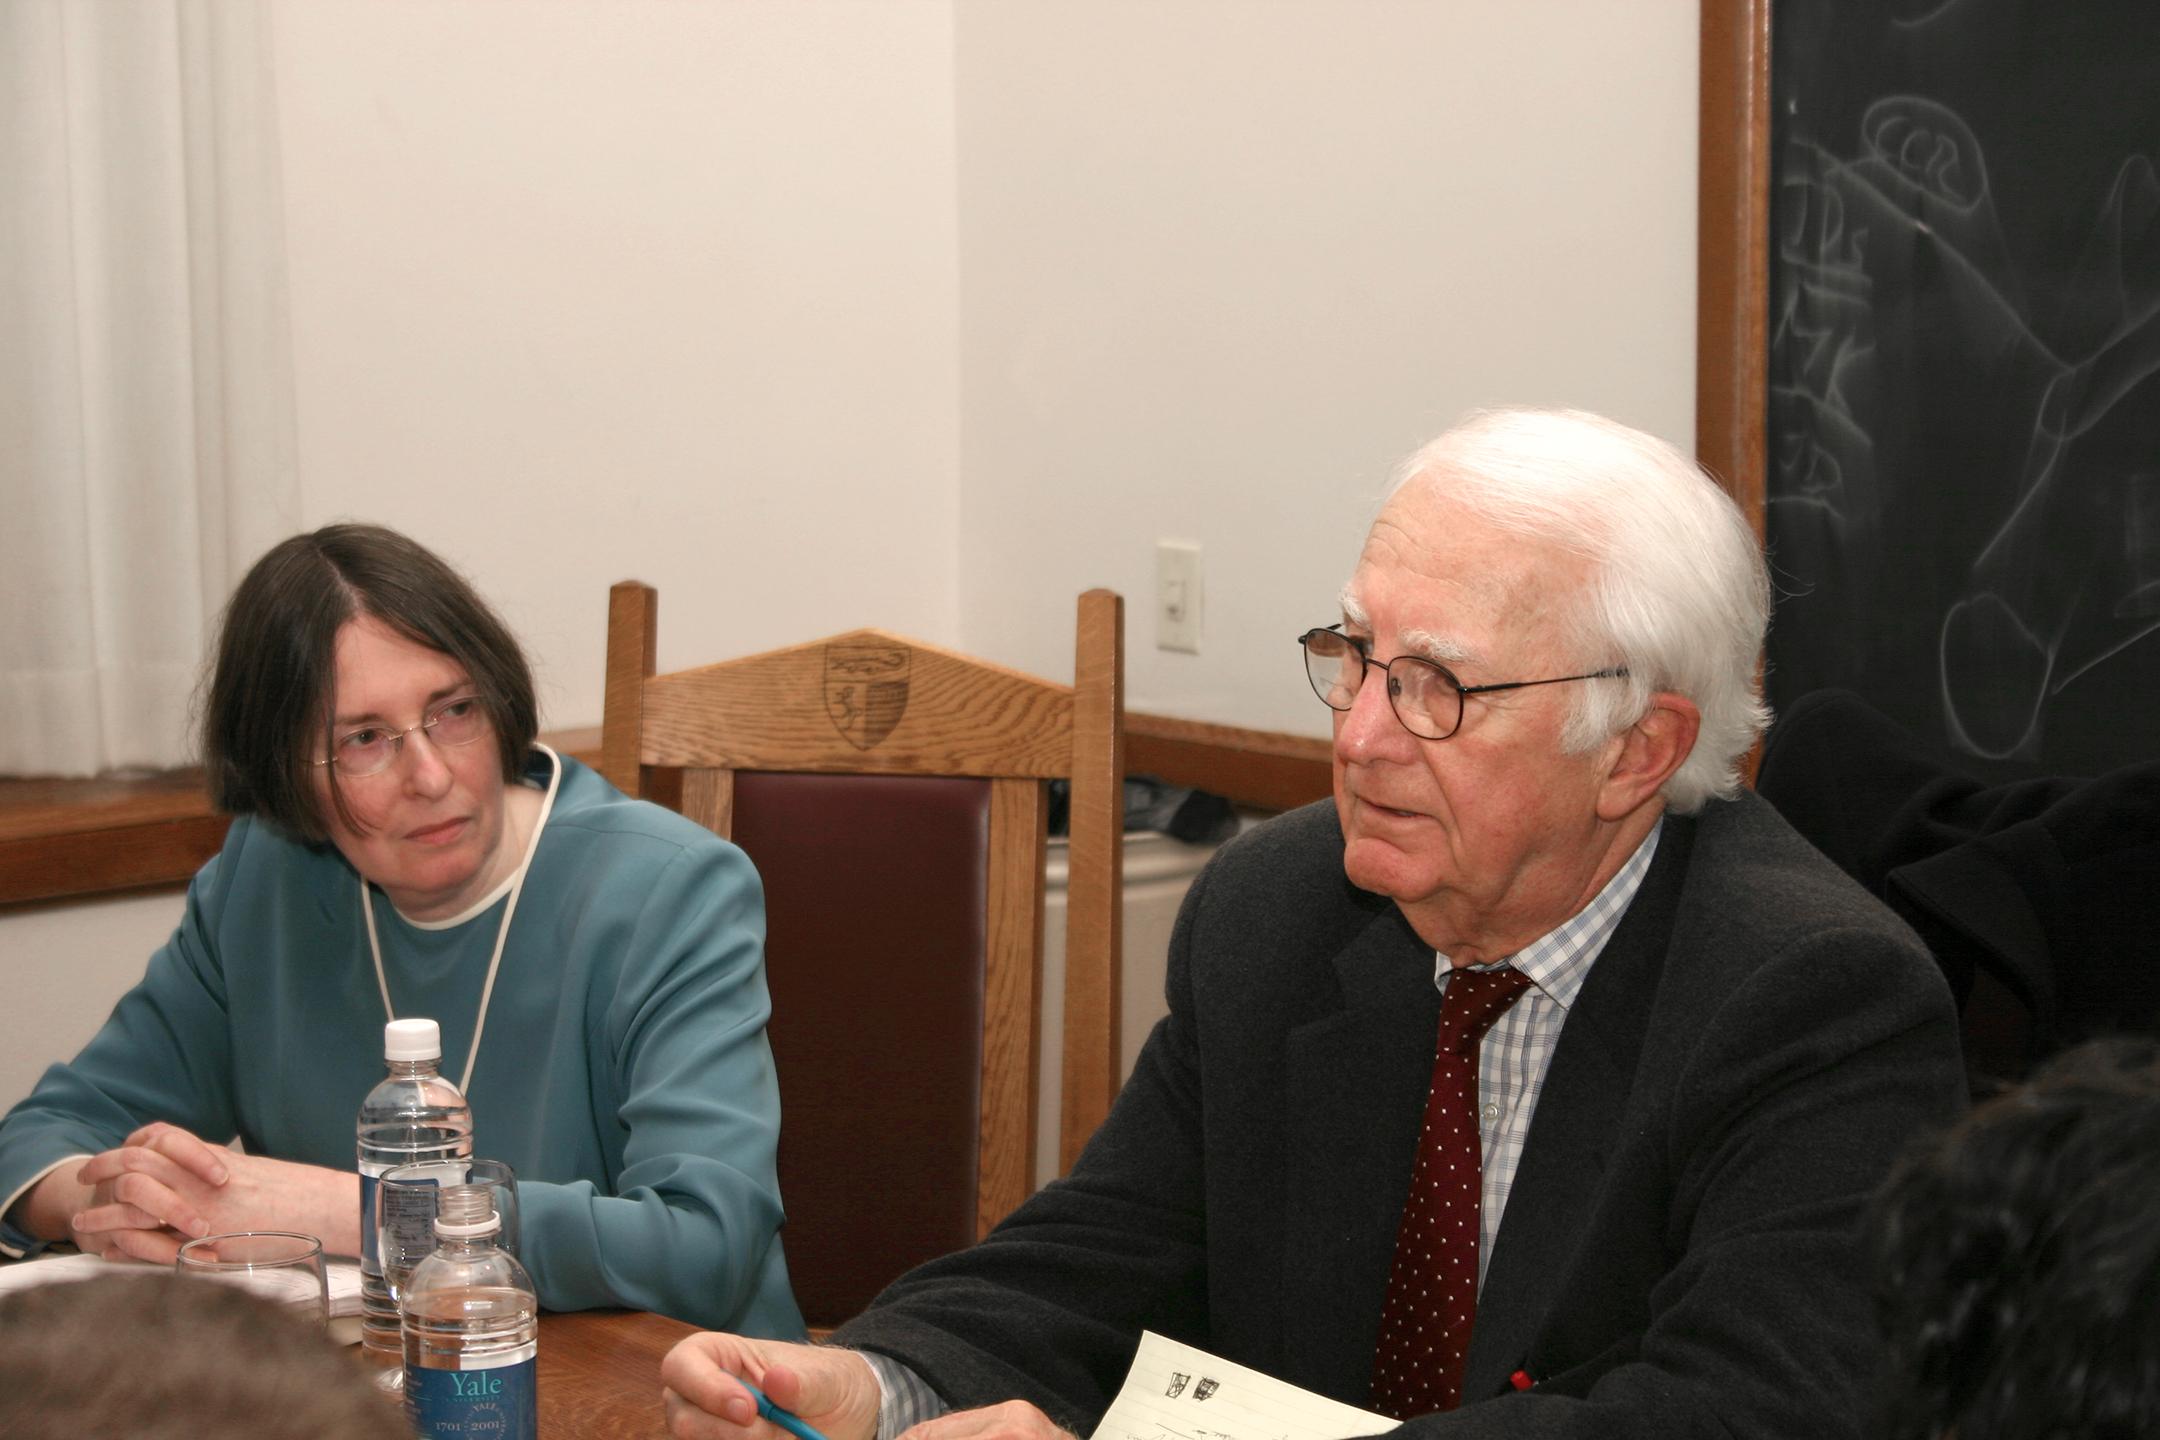 YLS Prof. and Center Dir. Roberta Romano '80 and Alan U. Schwartz '56